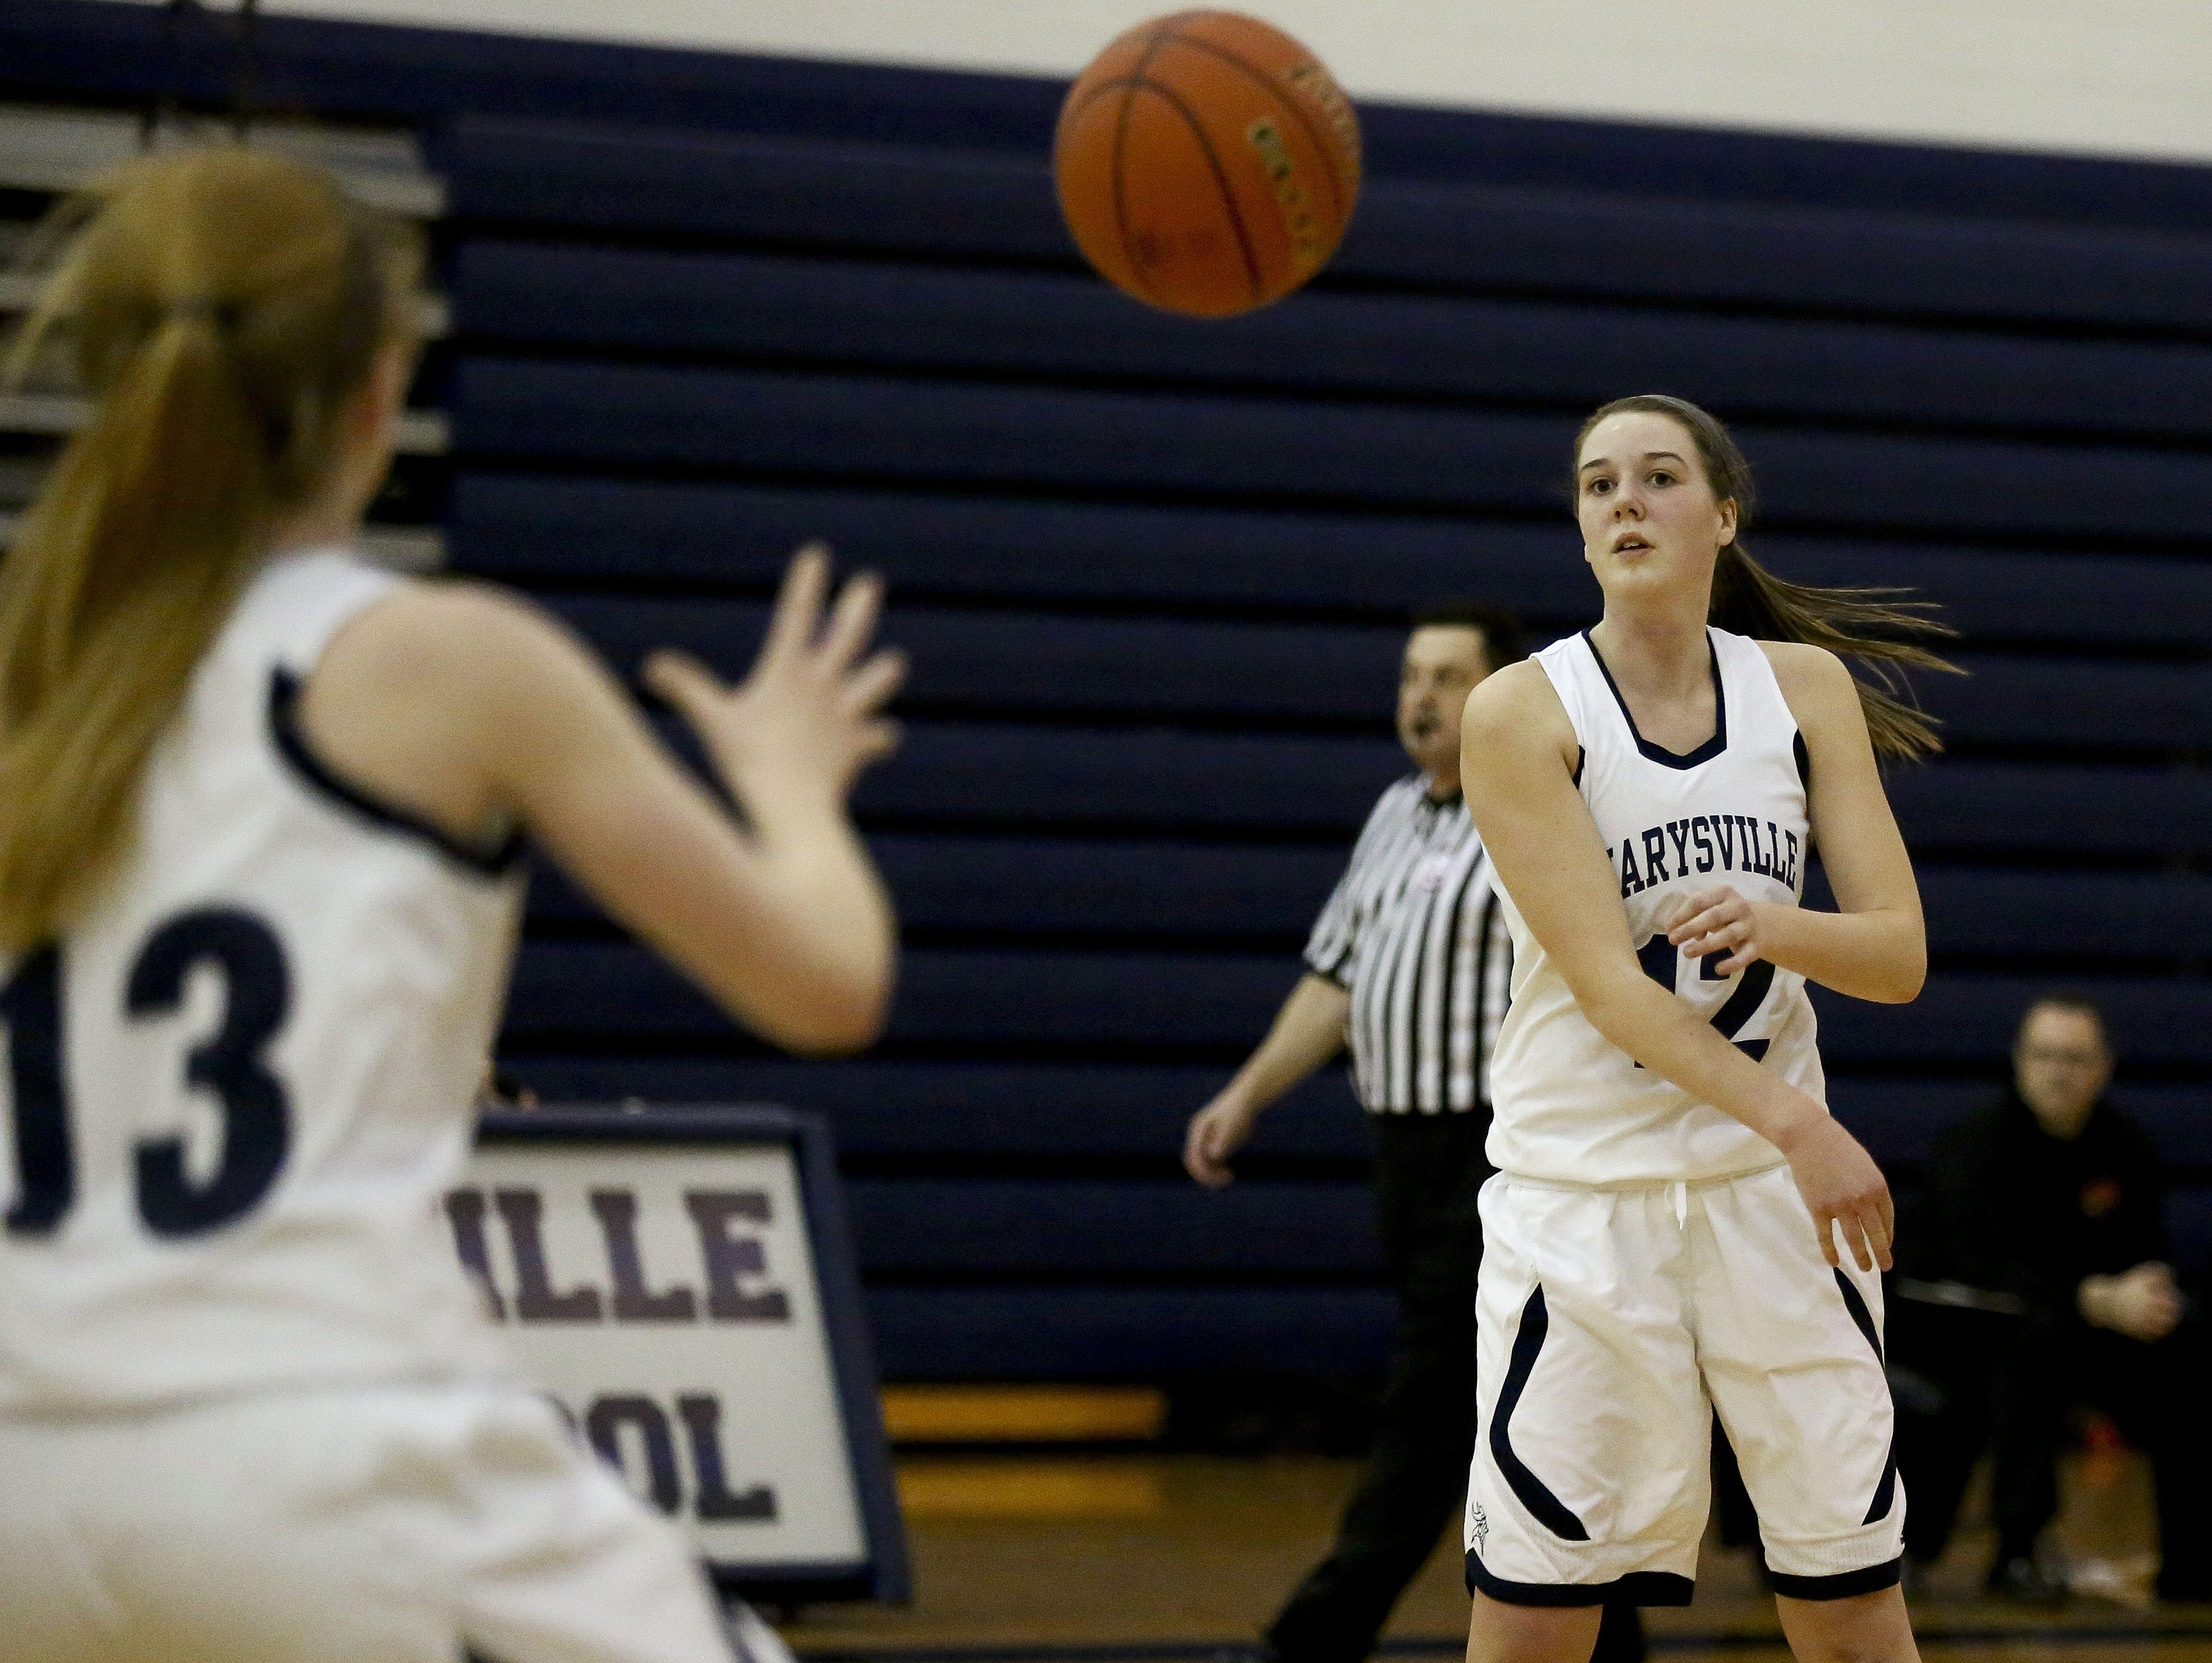 Marysville senior Devan Valko passes the ball during a basketball game Friday, Jan. 8, 2016 at Marysville High School.